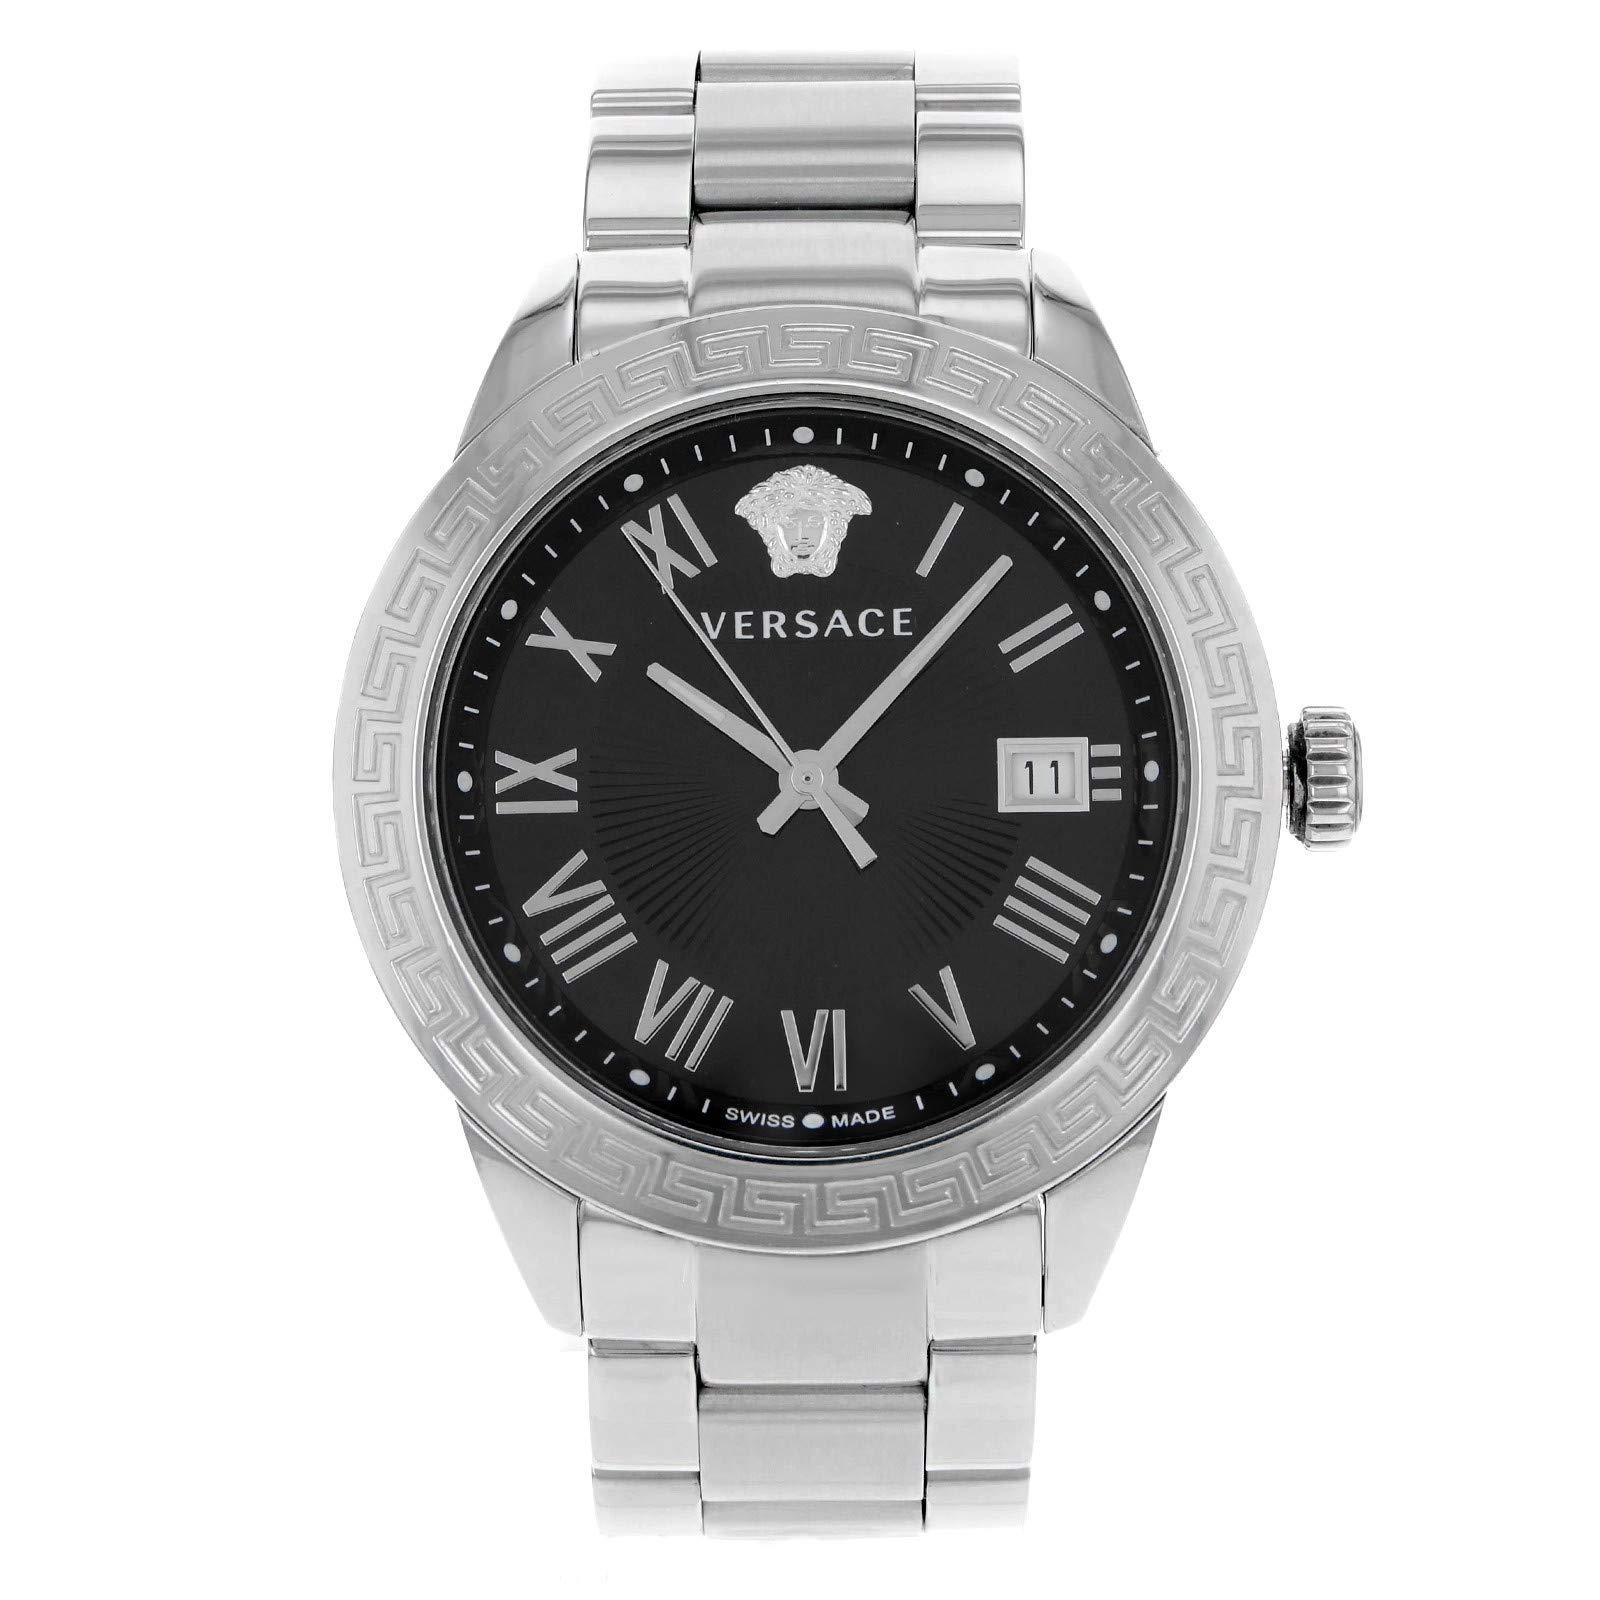 Versace Landmark Quartz Male Watch P6Q99GD008S099 (Certified Pre-Owned)